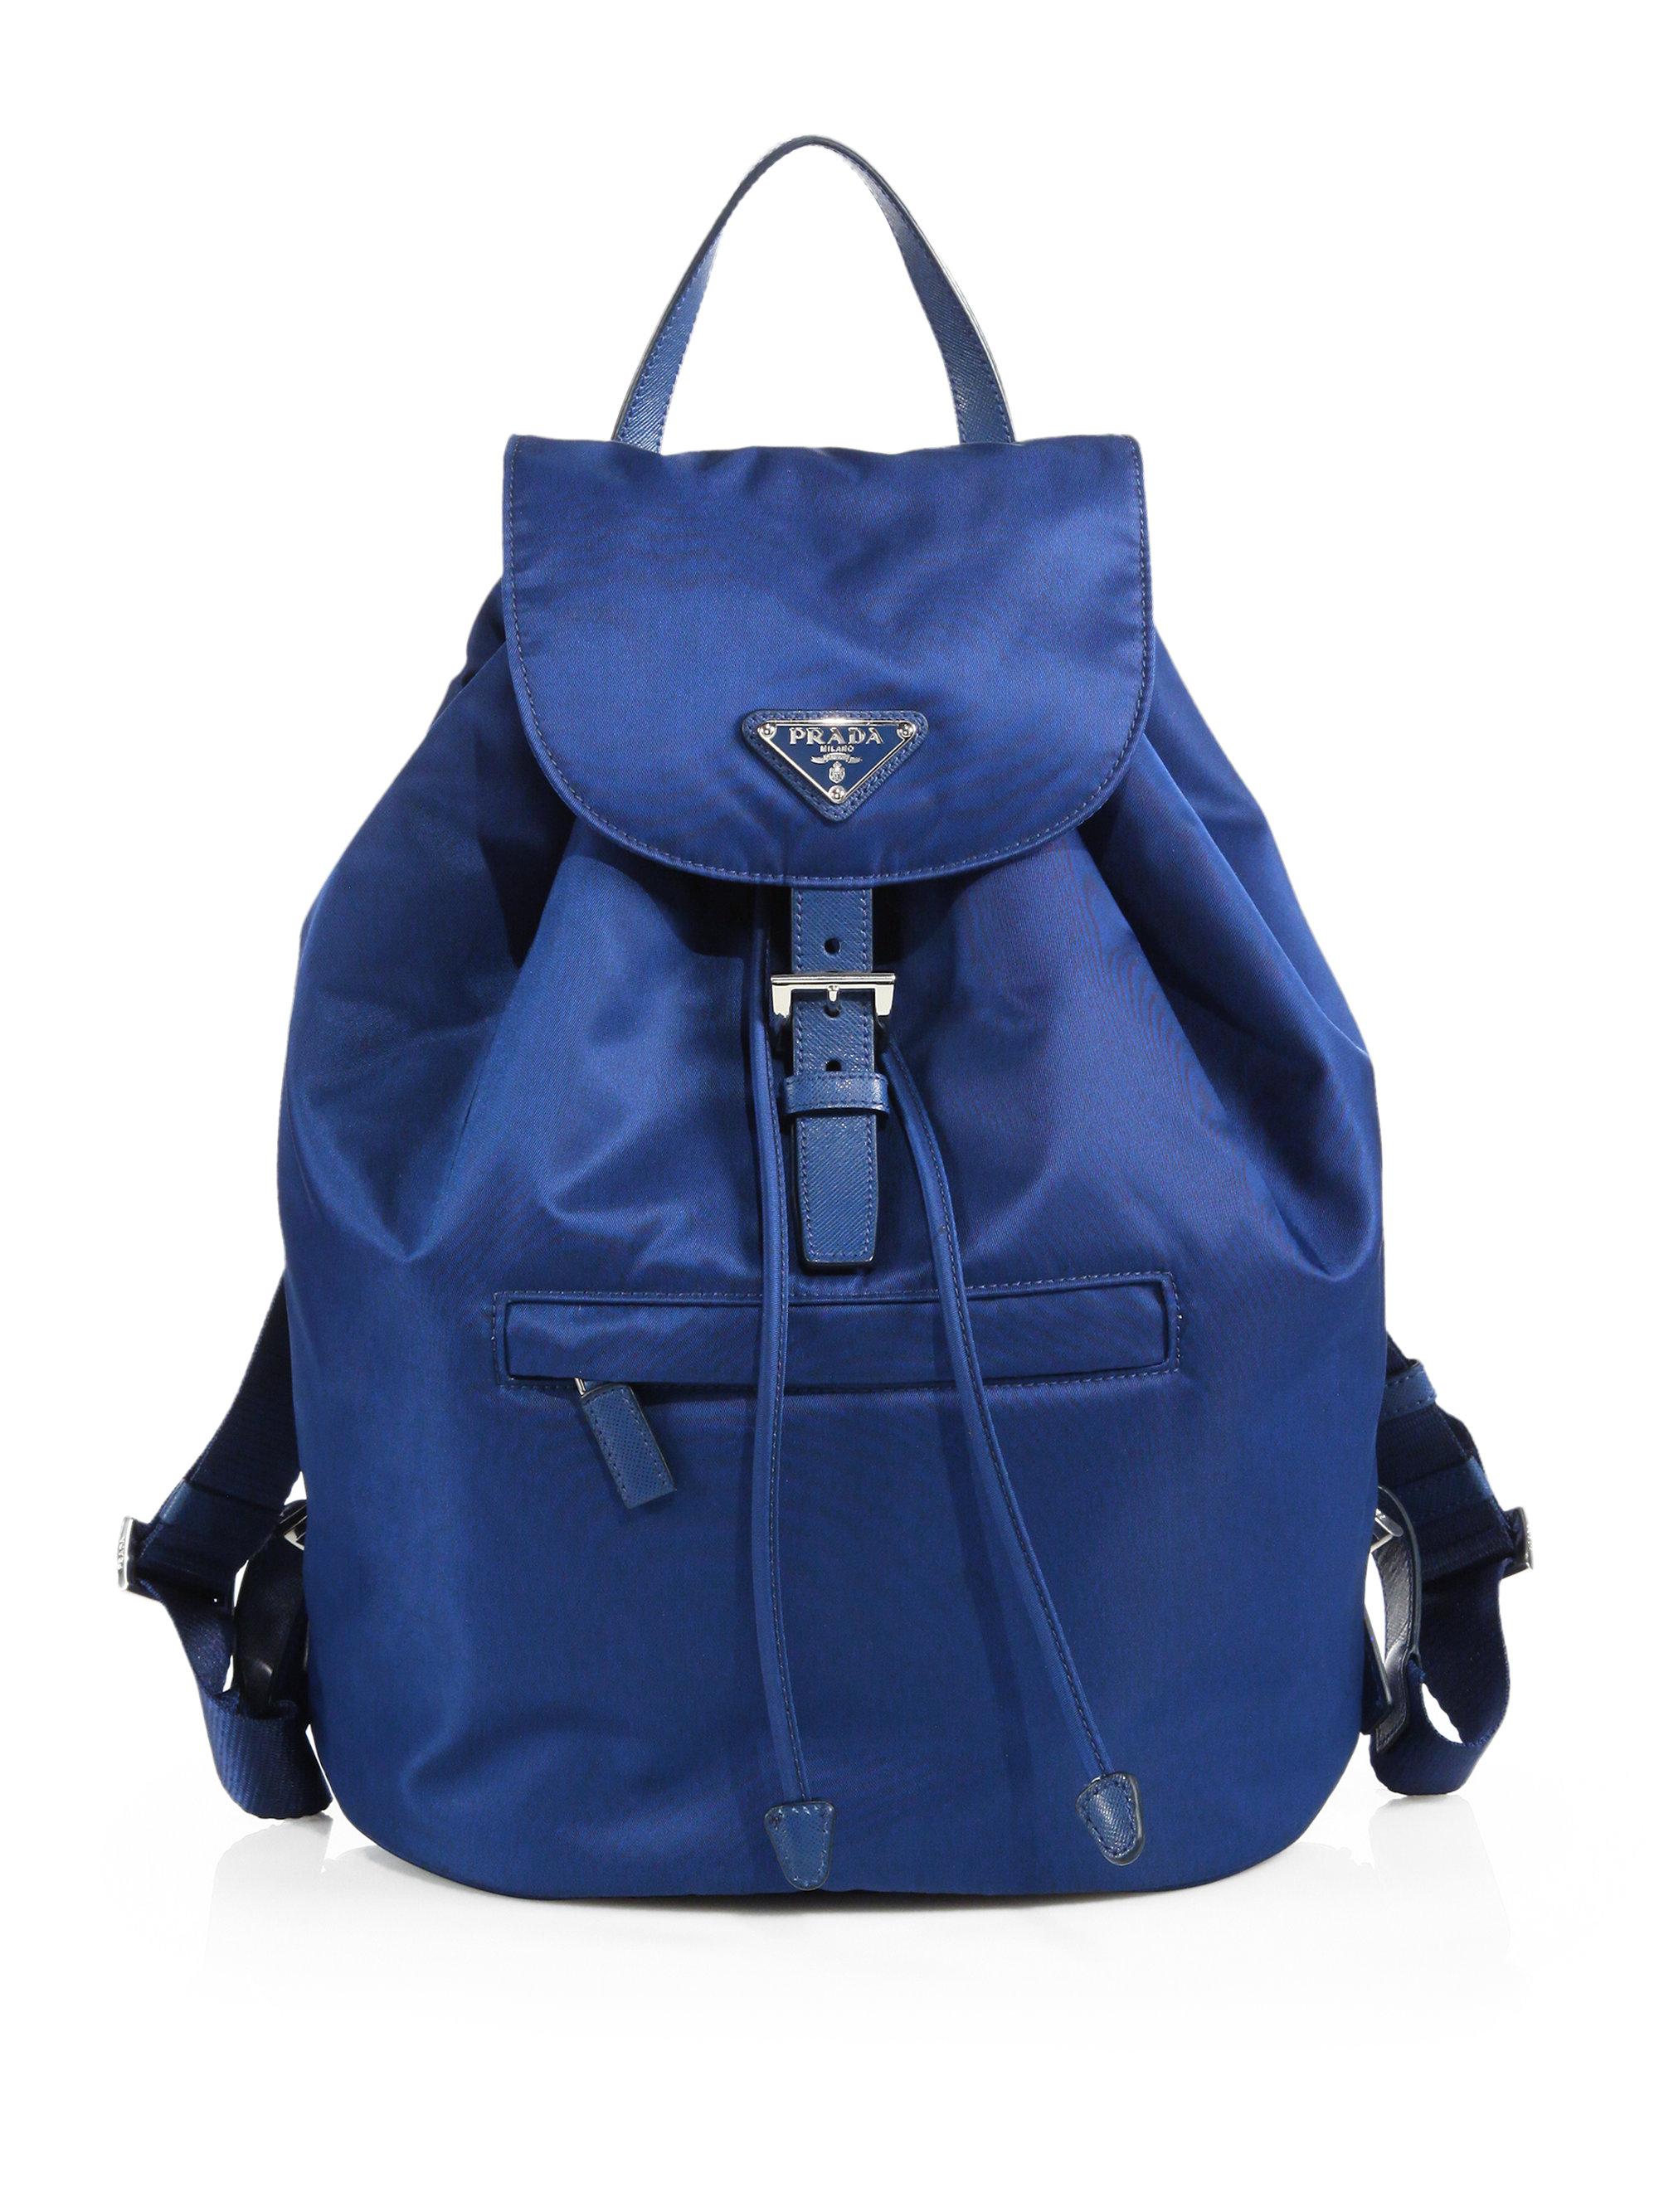 Prada Vela Backpack in Blue (ROYAL-BLUE) | Lyst